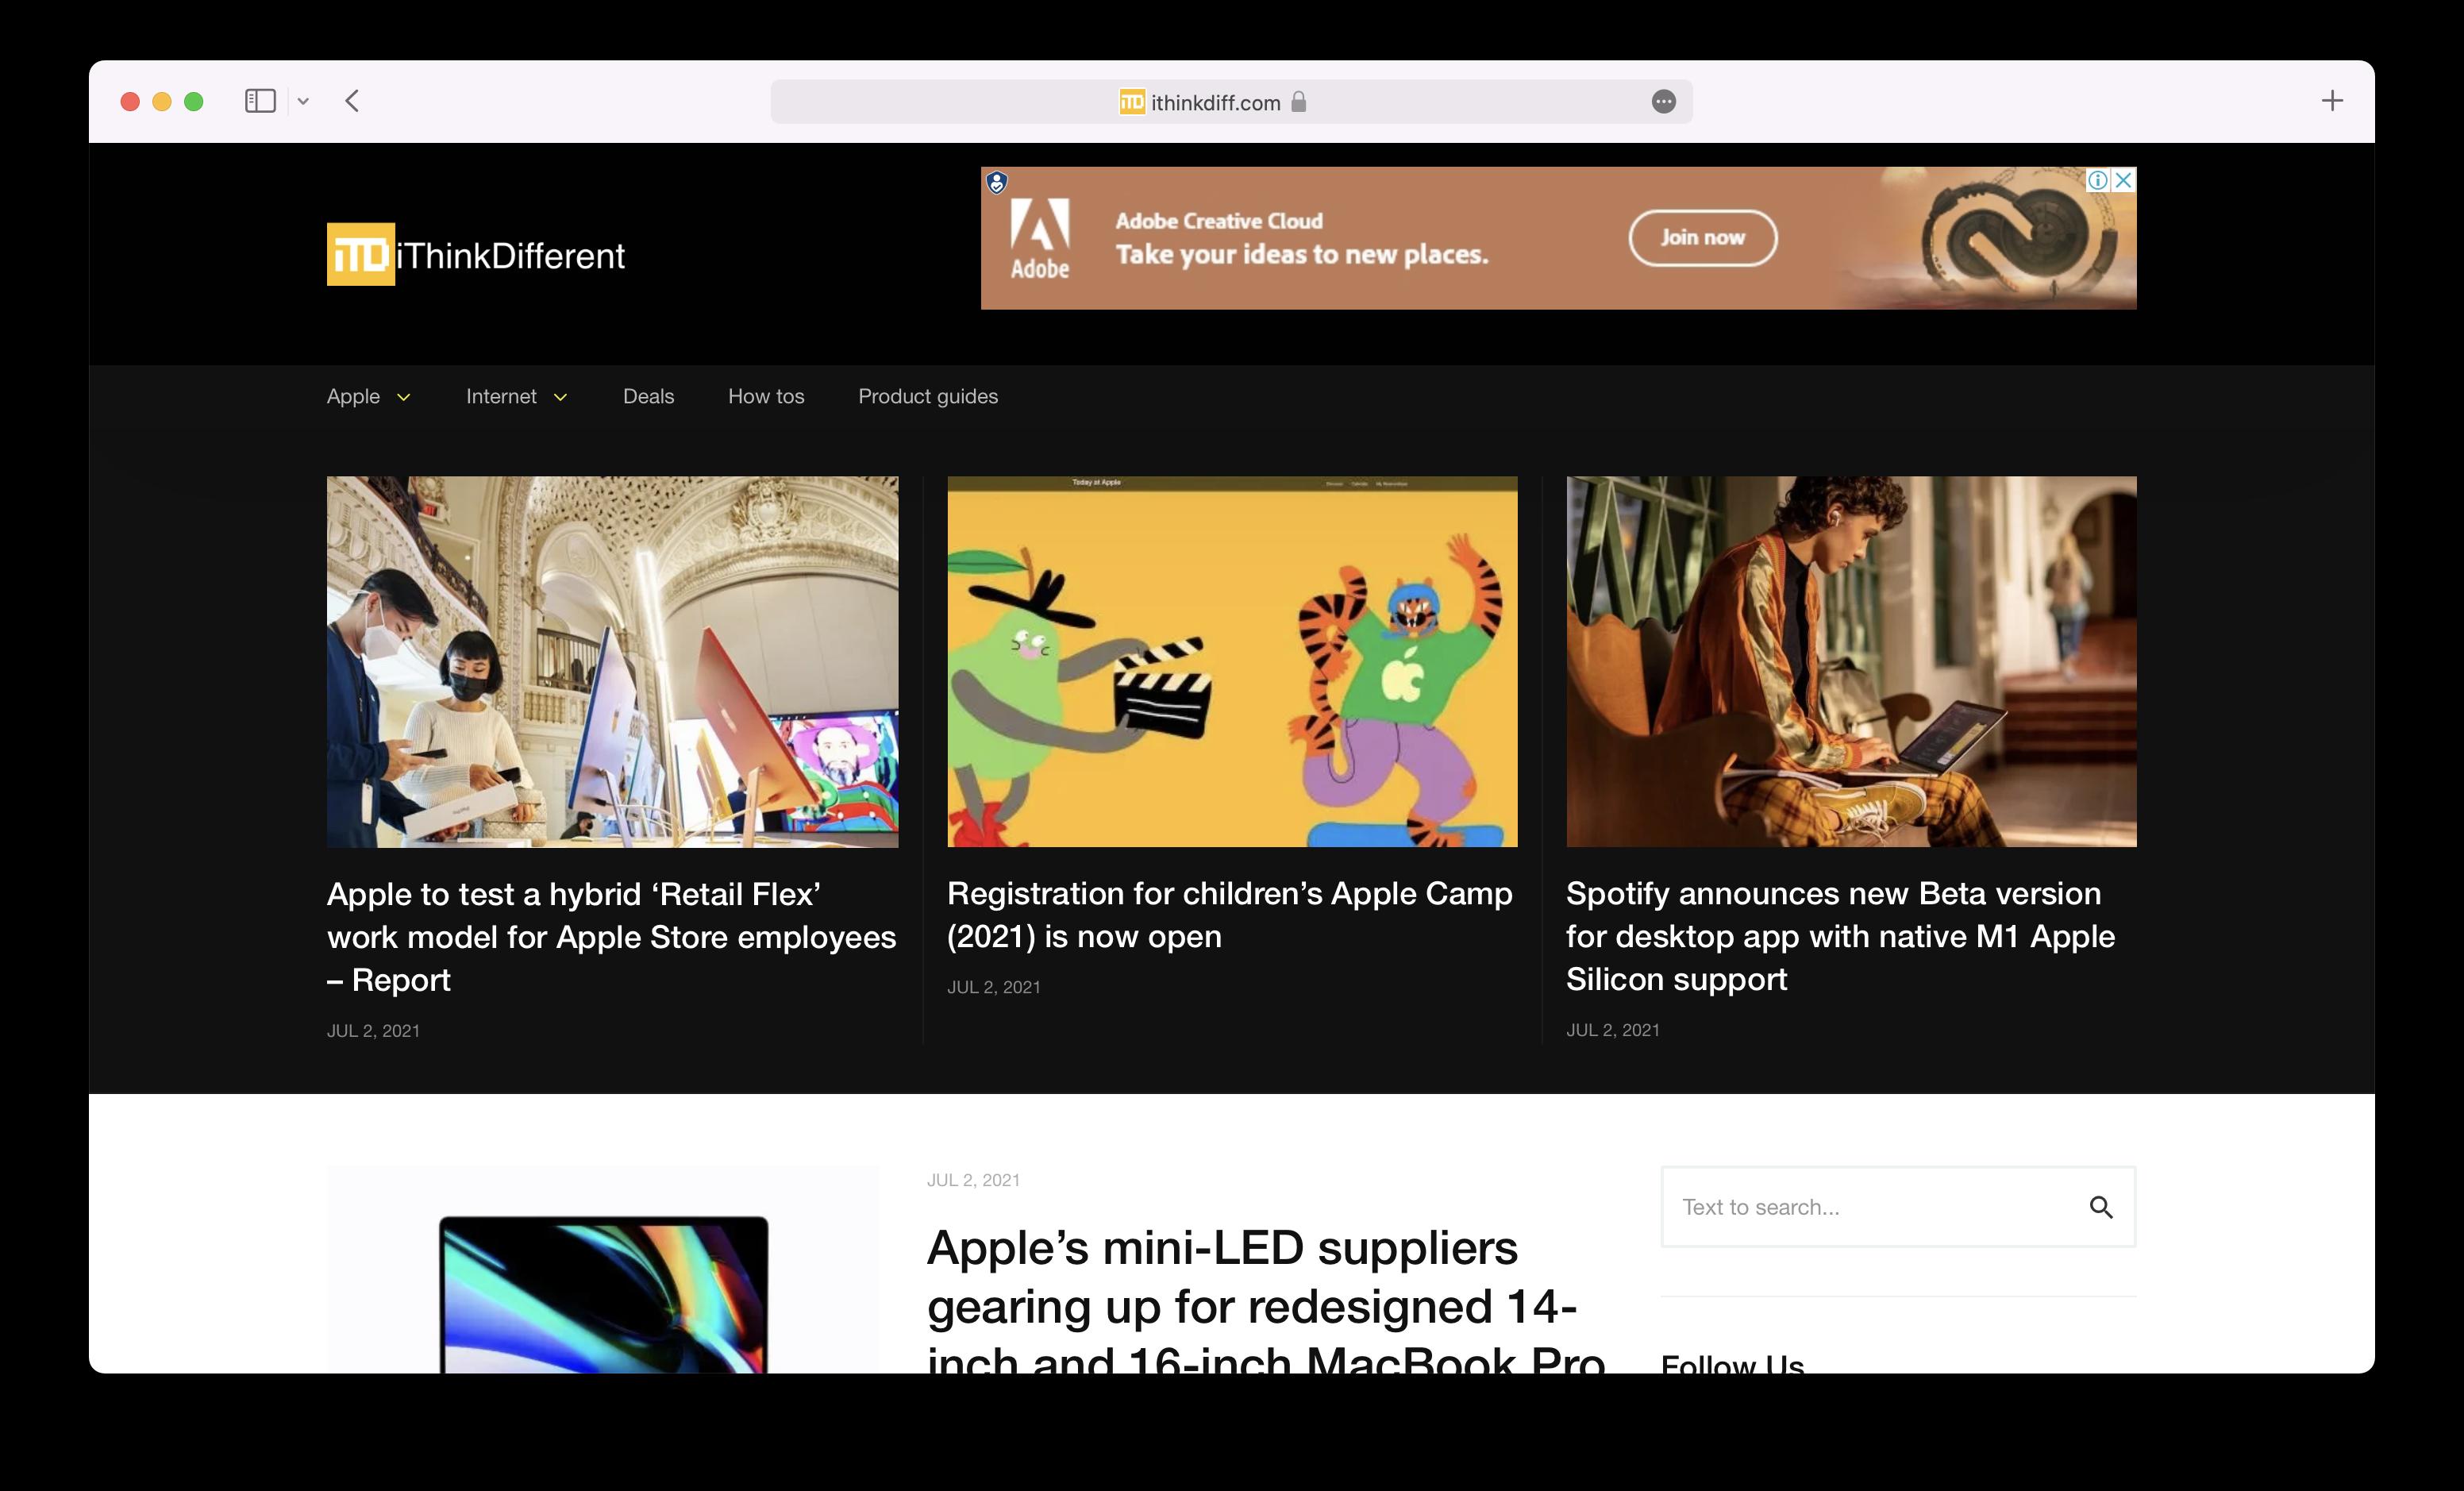 Safari macOS Monterey tab bar color disabled